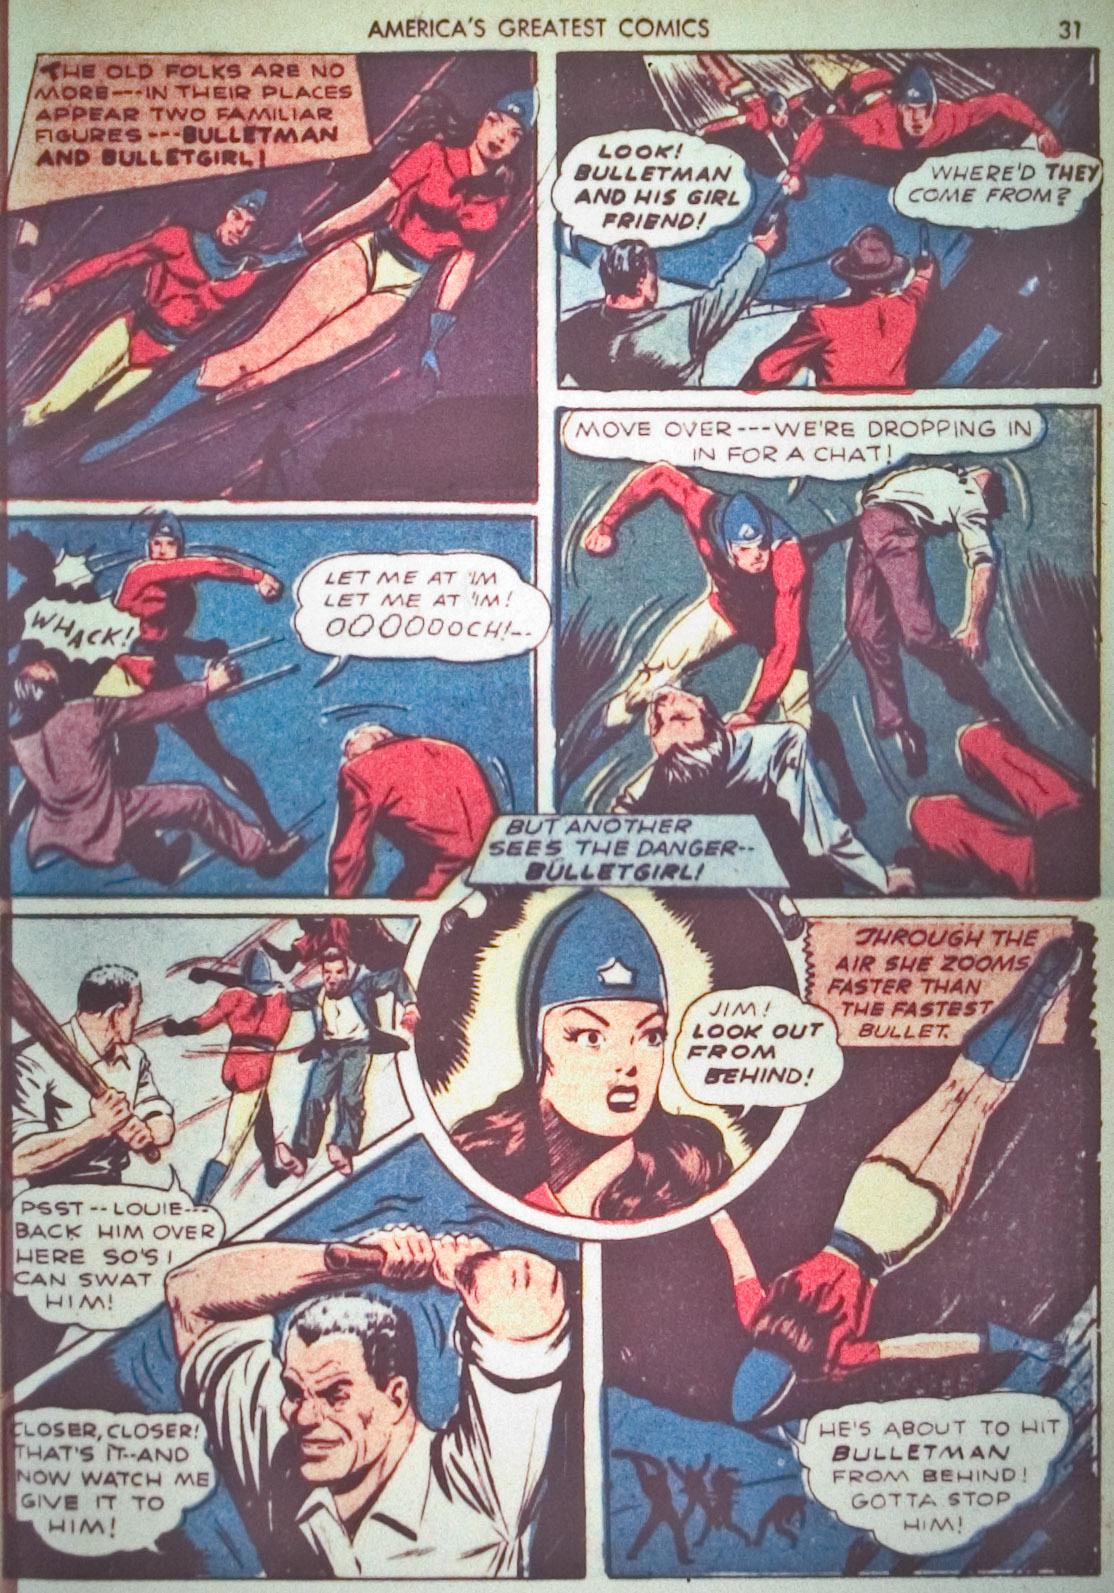 Read online America's Greatest Comics comic -  Issue #1 - 34